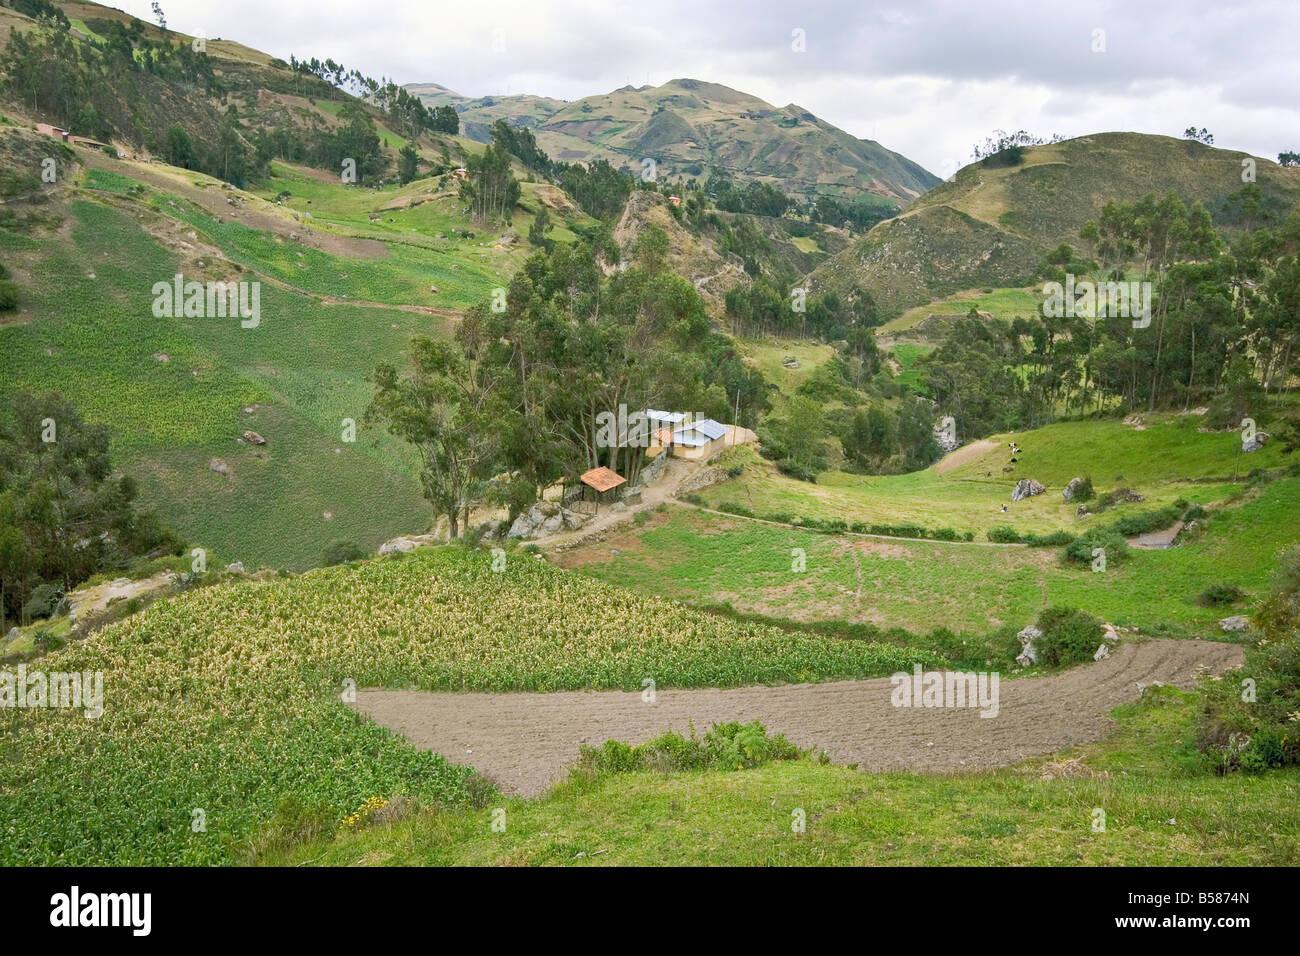 I campi di mais e la fattoria di indigeni Canari persone, Ingapirca, Canar Provincia, Ecuador Immagini Stock